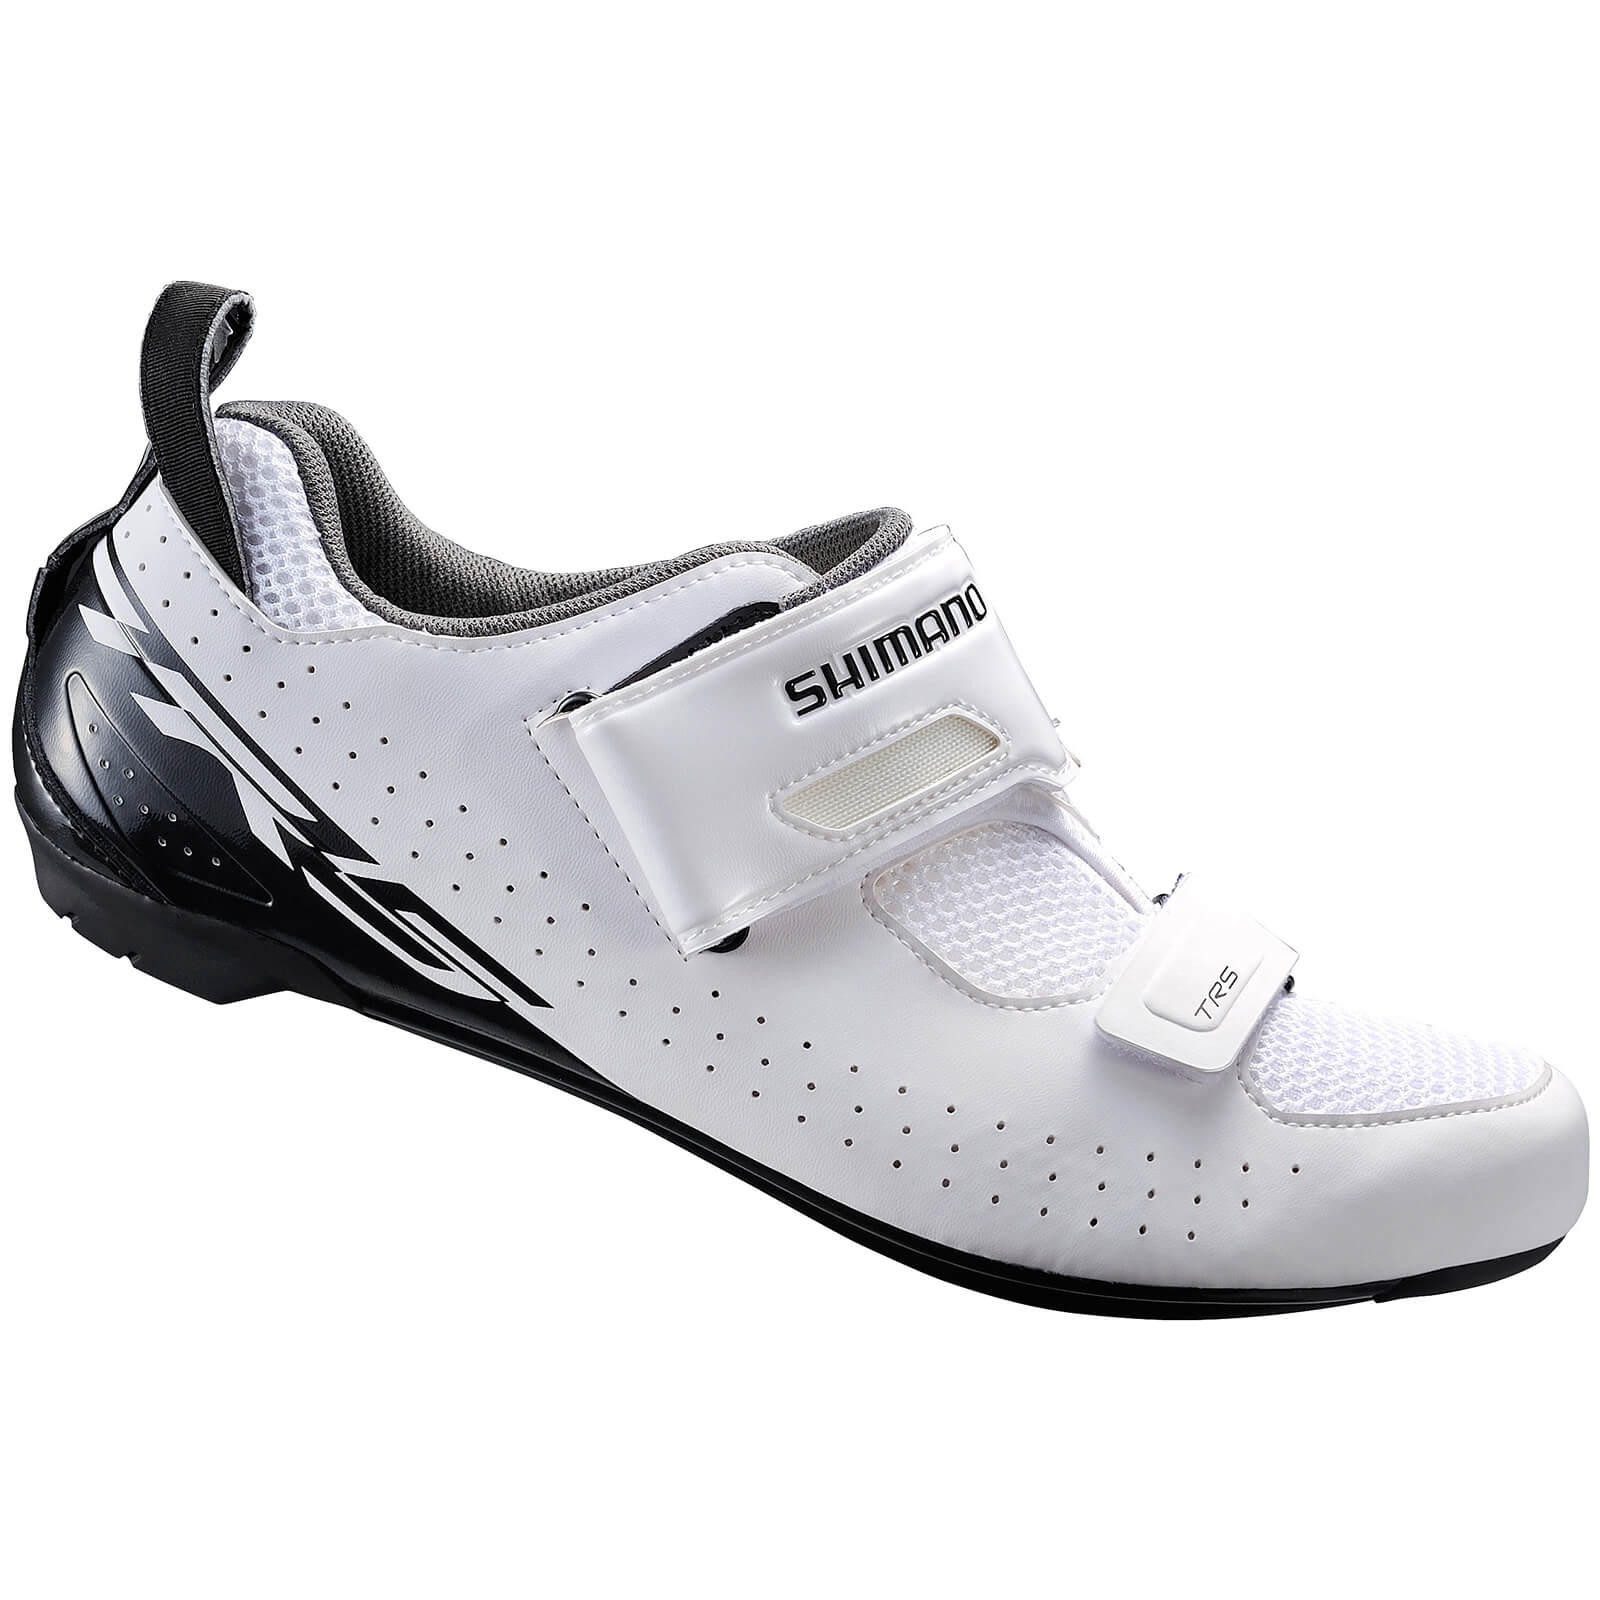 Shimano TR5 SPD-SL Triathlon-Schuhe - Weiß - EU 42 - Weiß